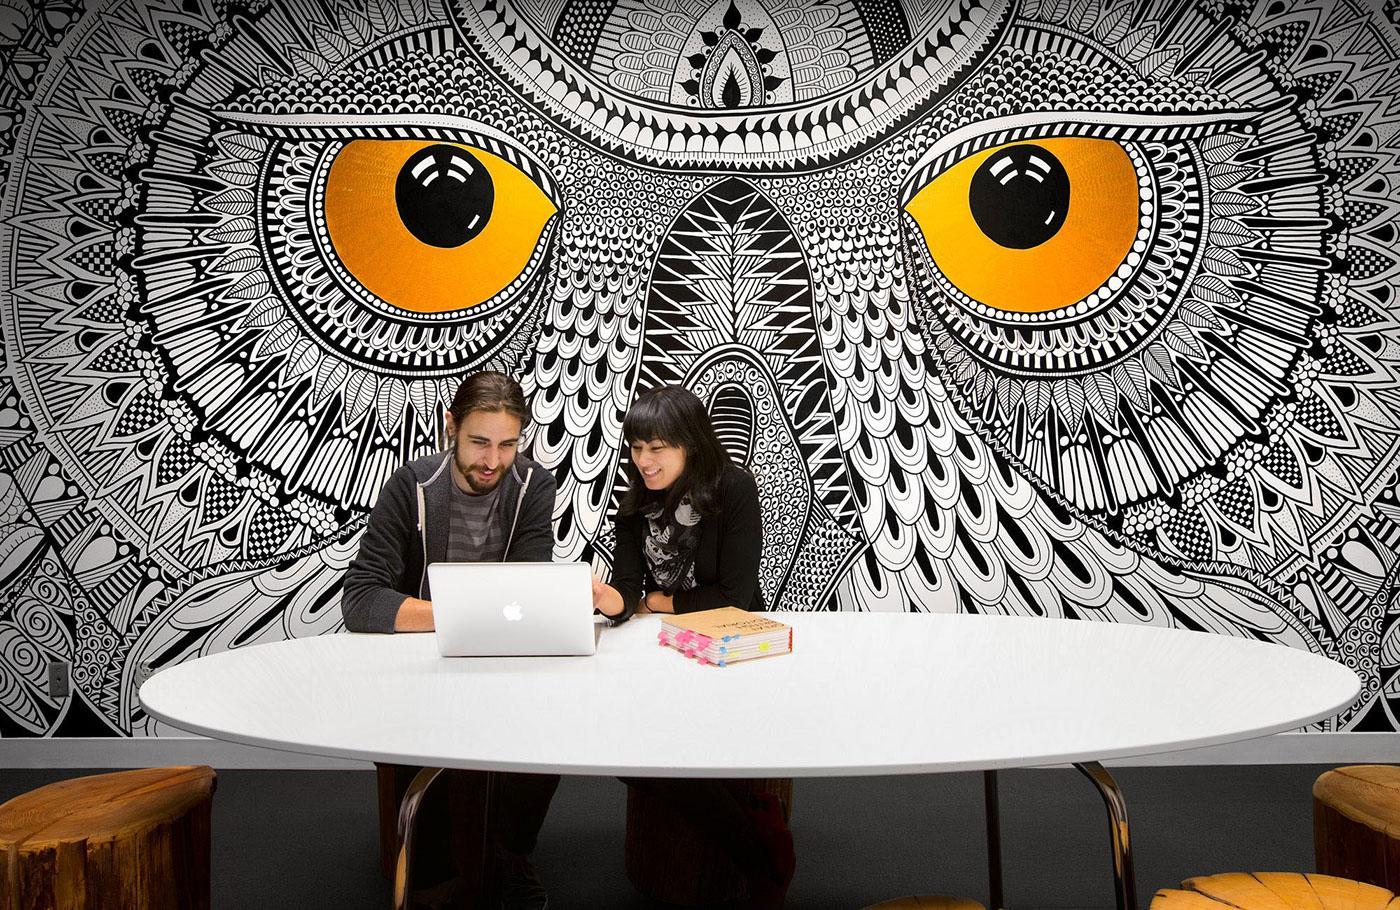 Hootsuite's amazing boardroom mural